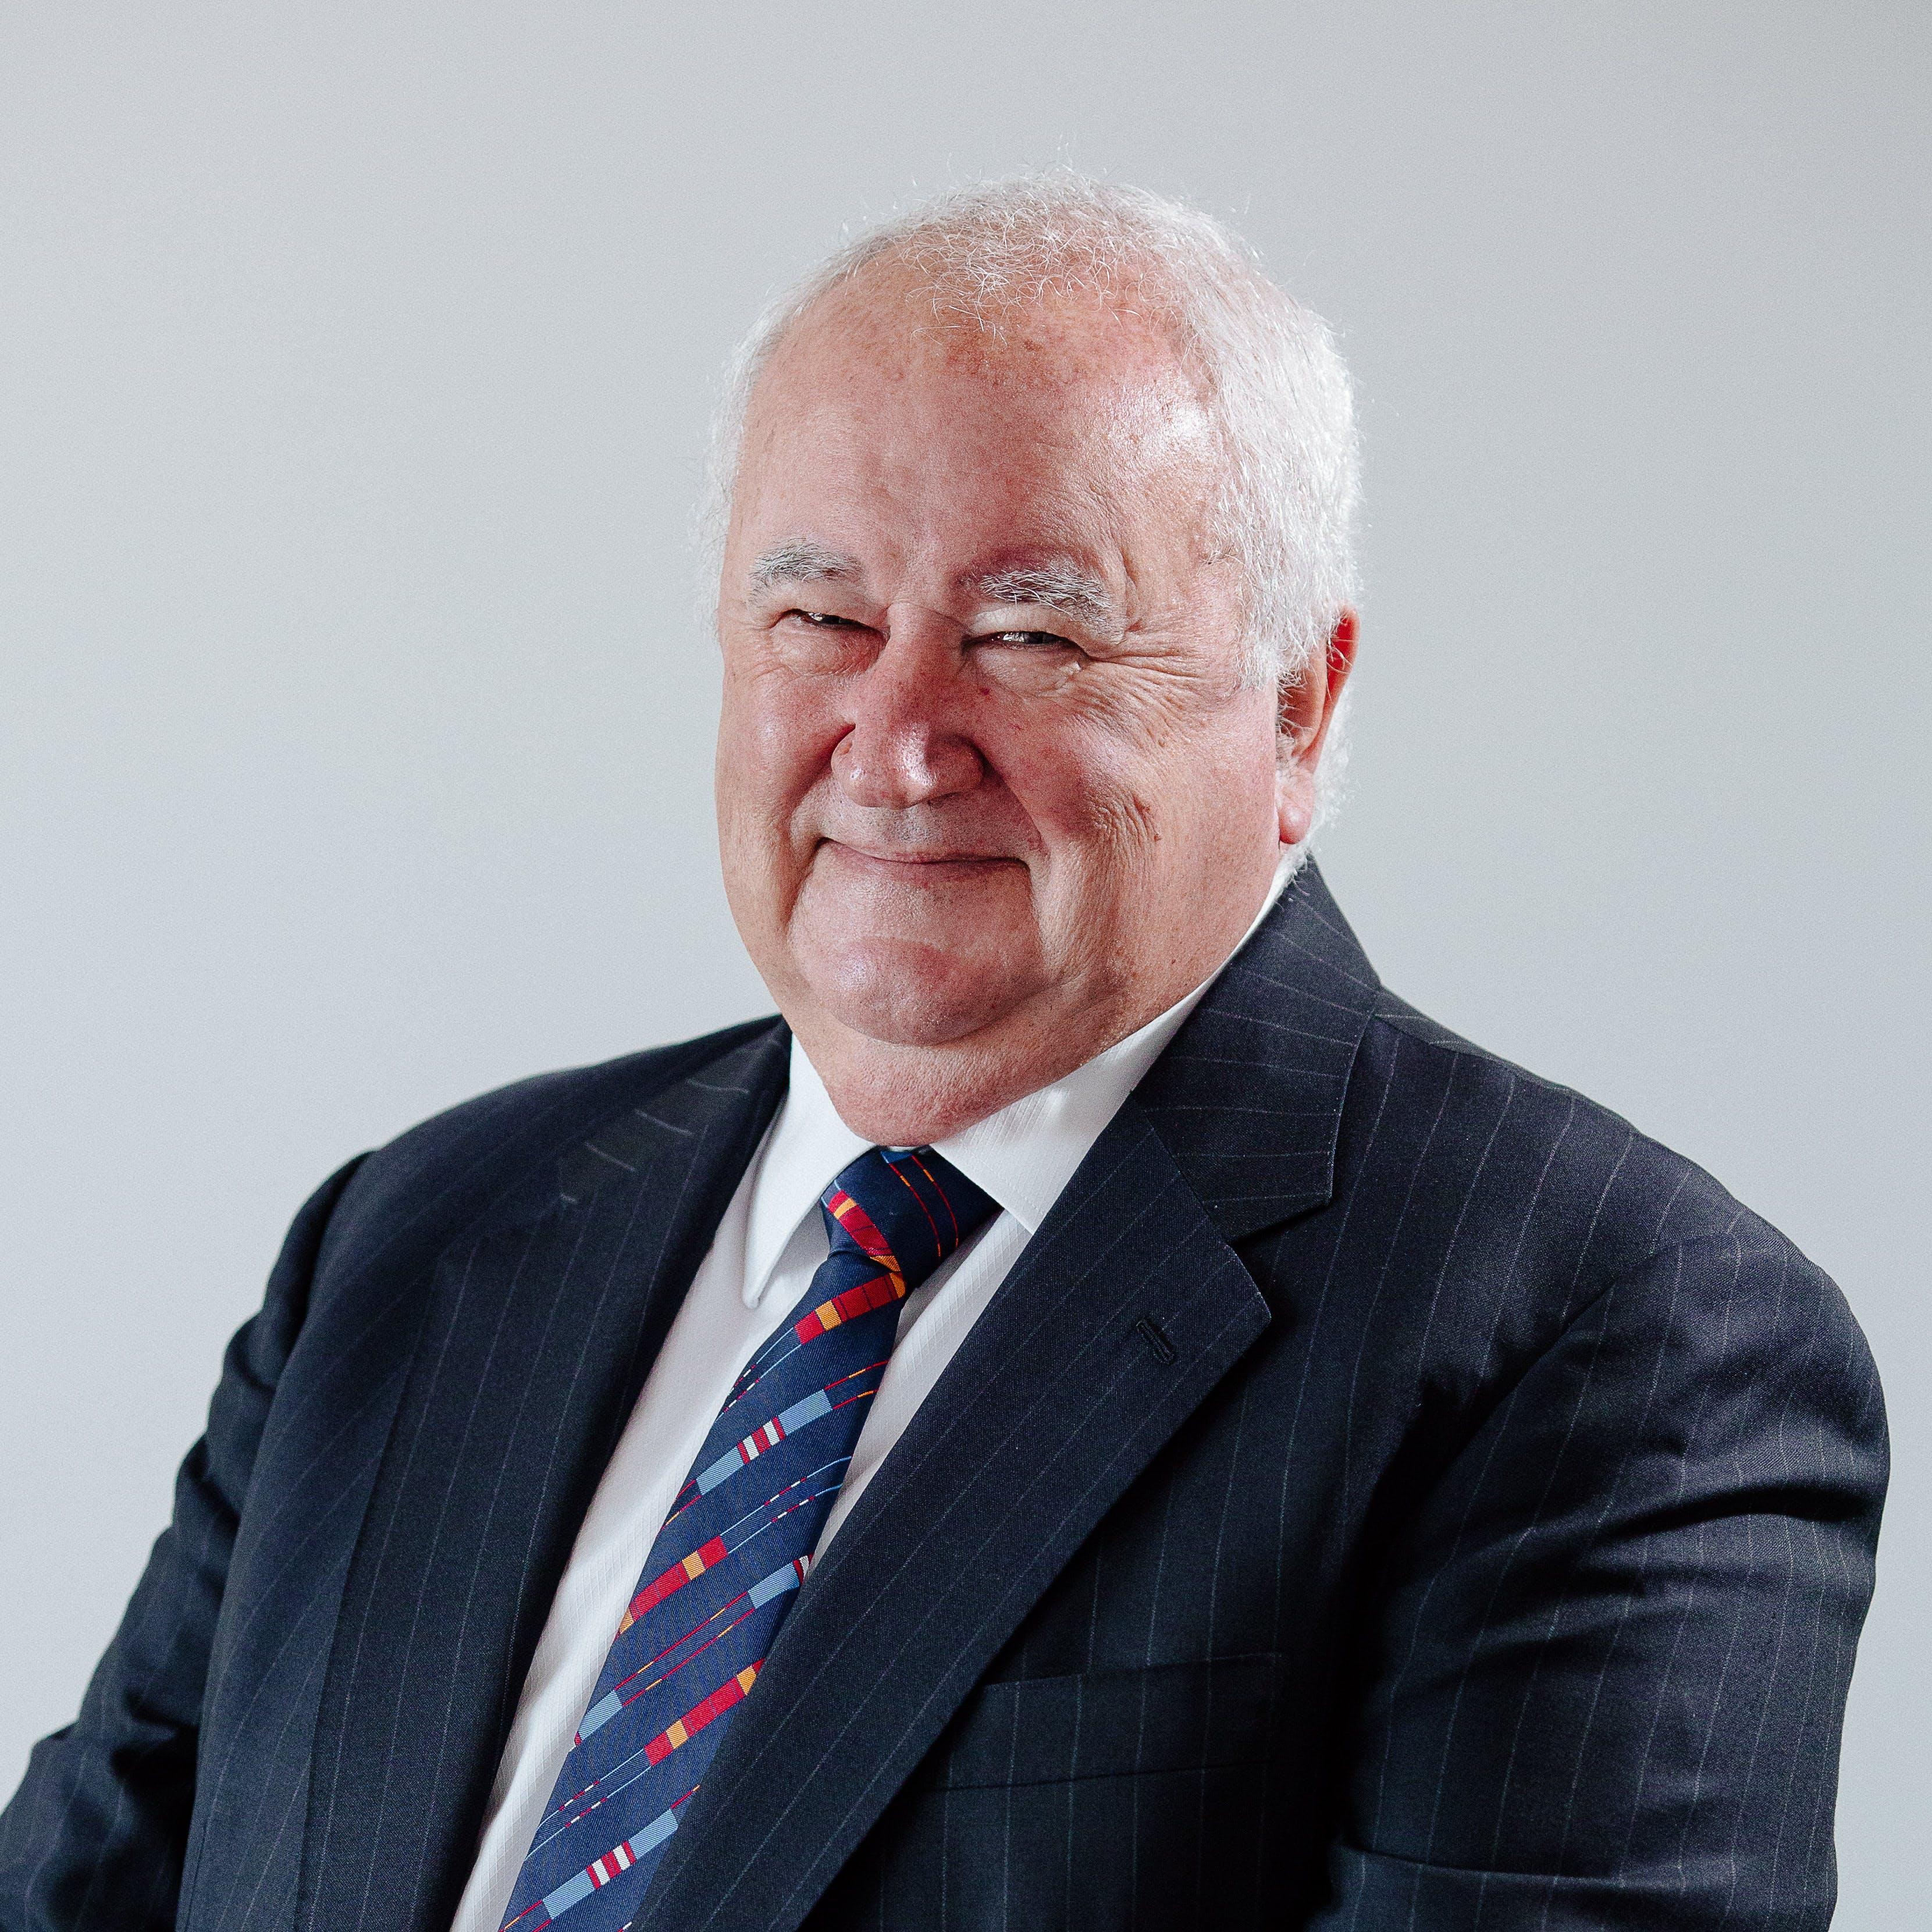 Brian Scullin, Chairman